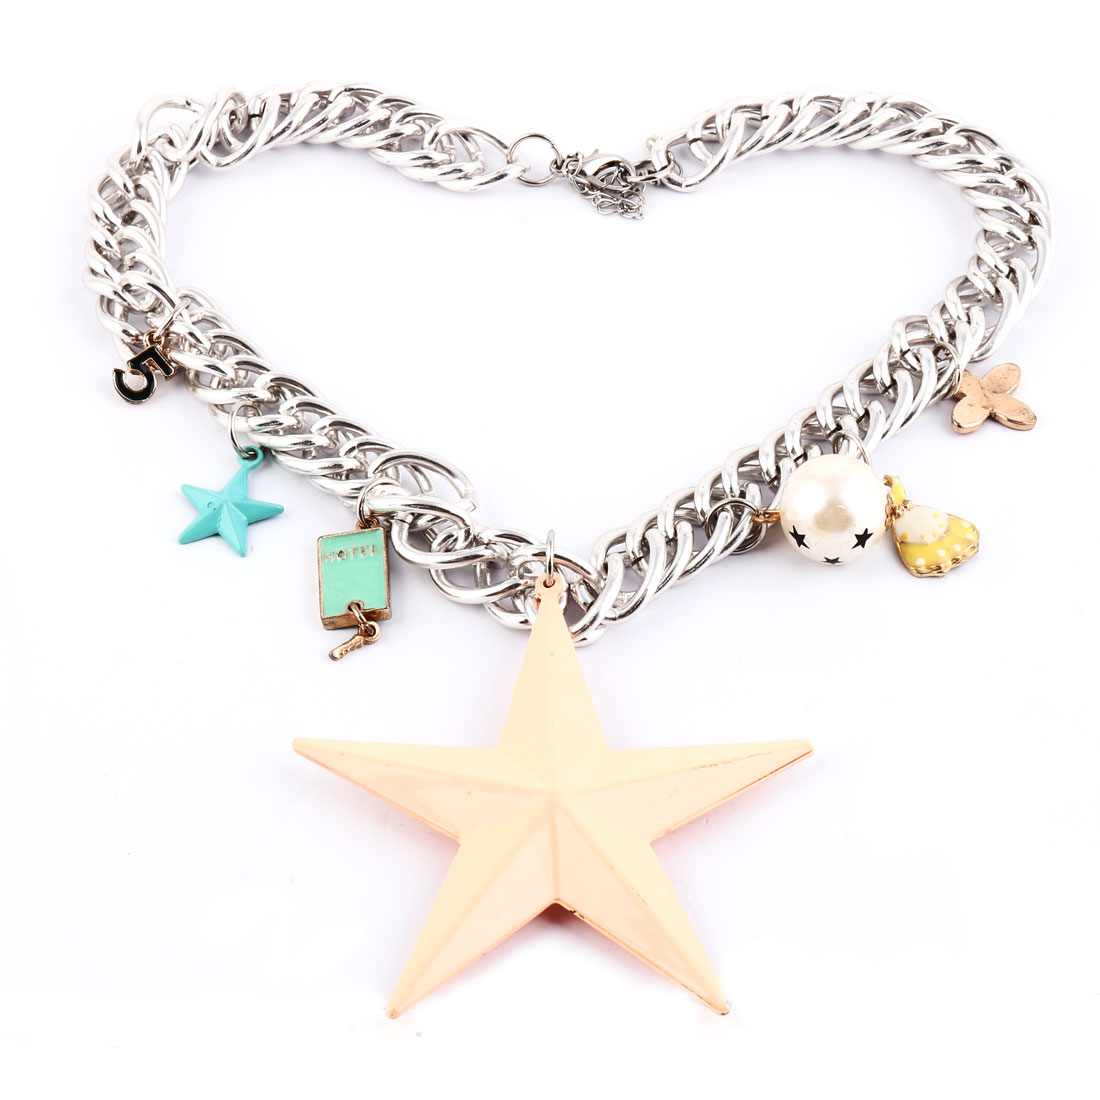 Party Girl Star Pendant Decoration Charm Statement Necklace Neck Chain Decor Peach Orange